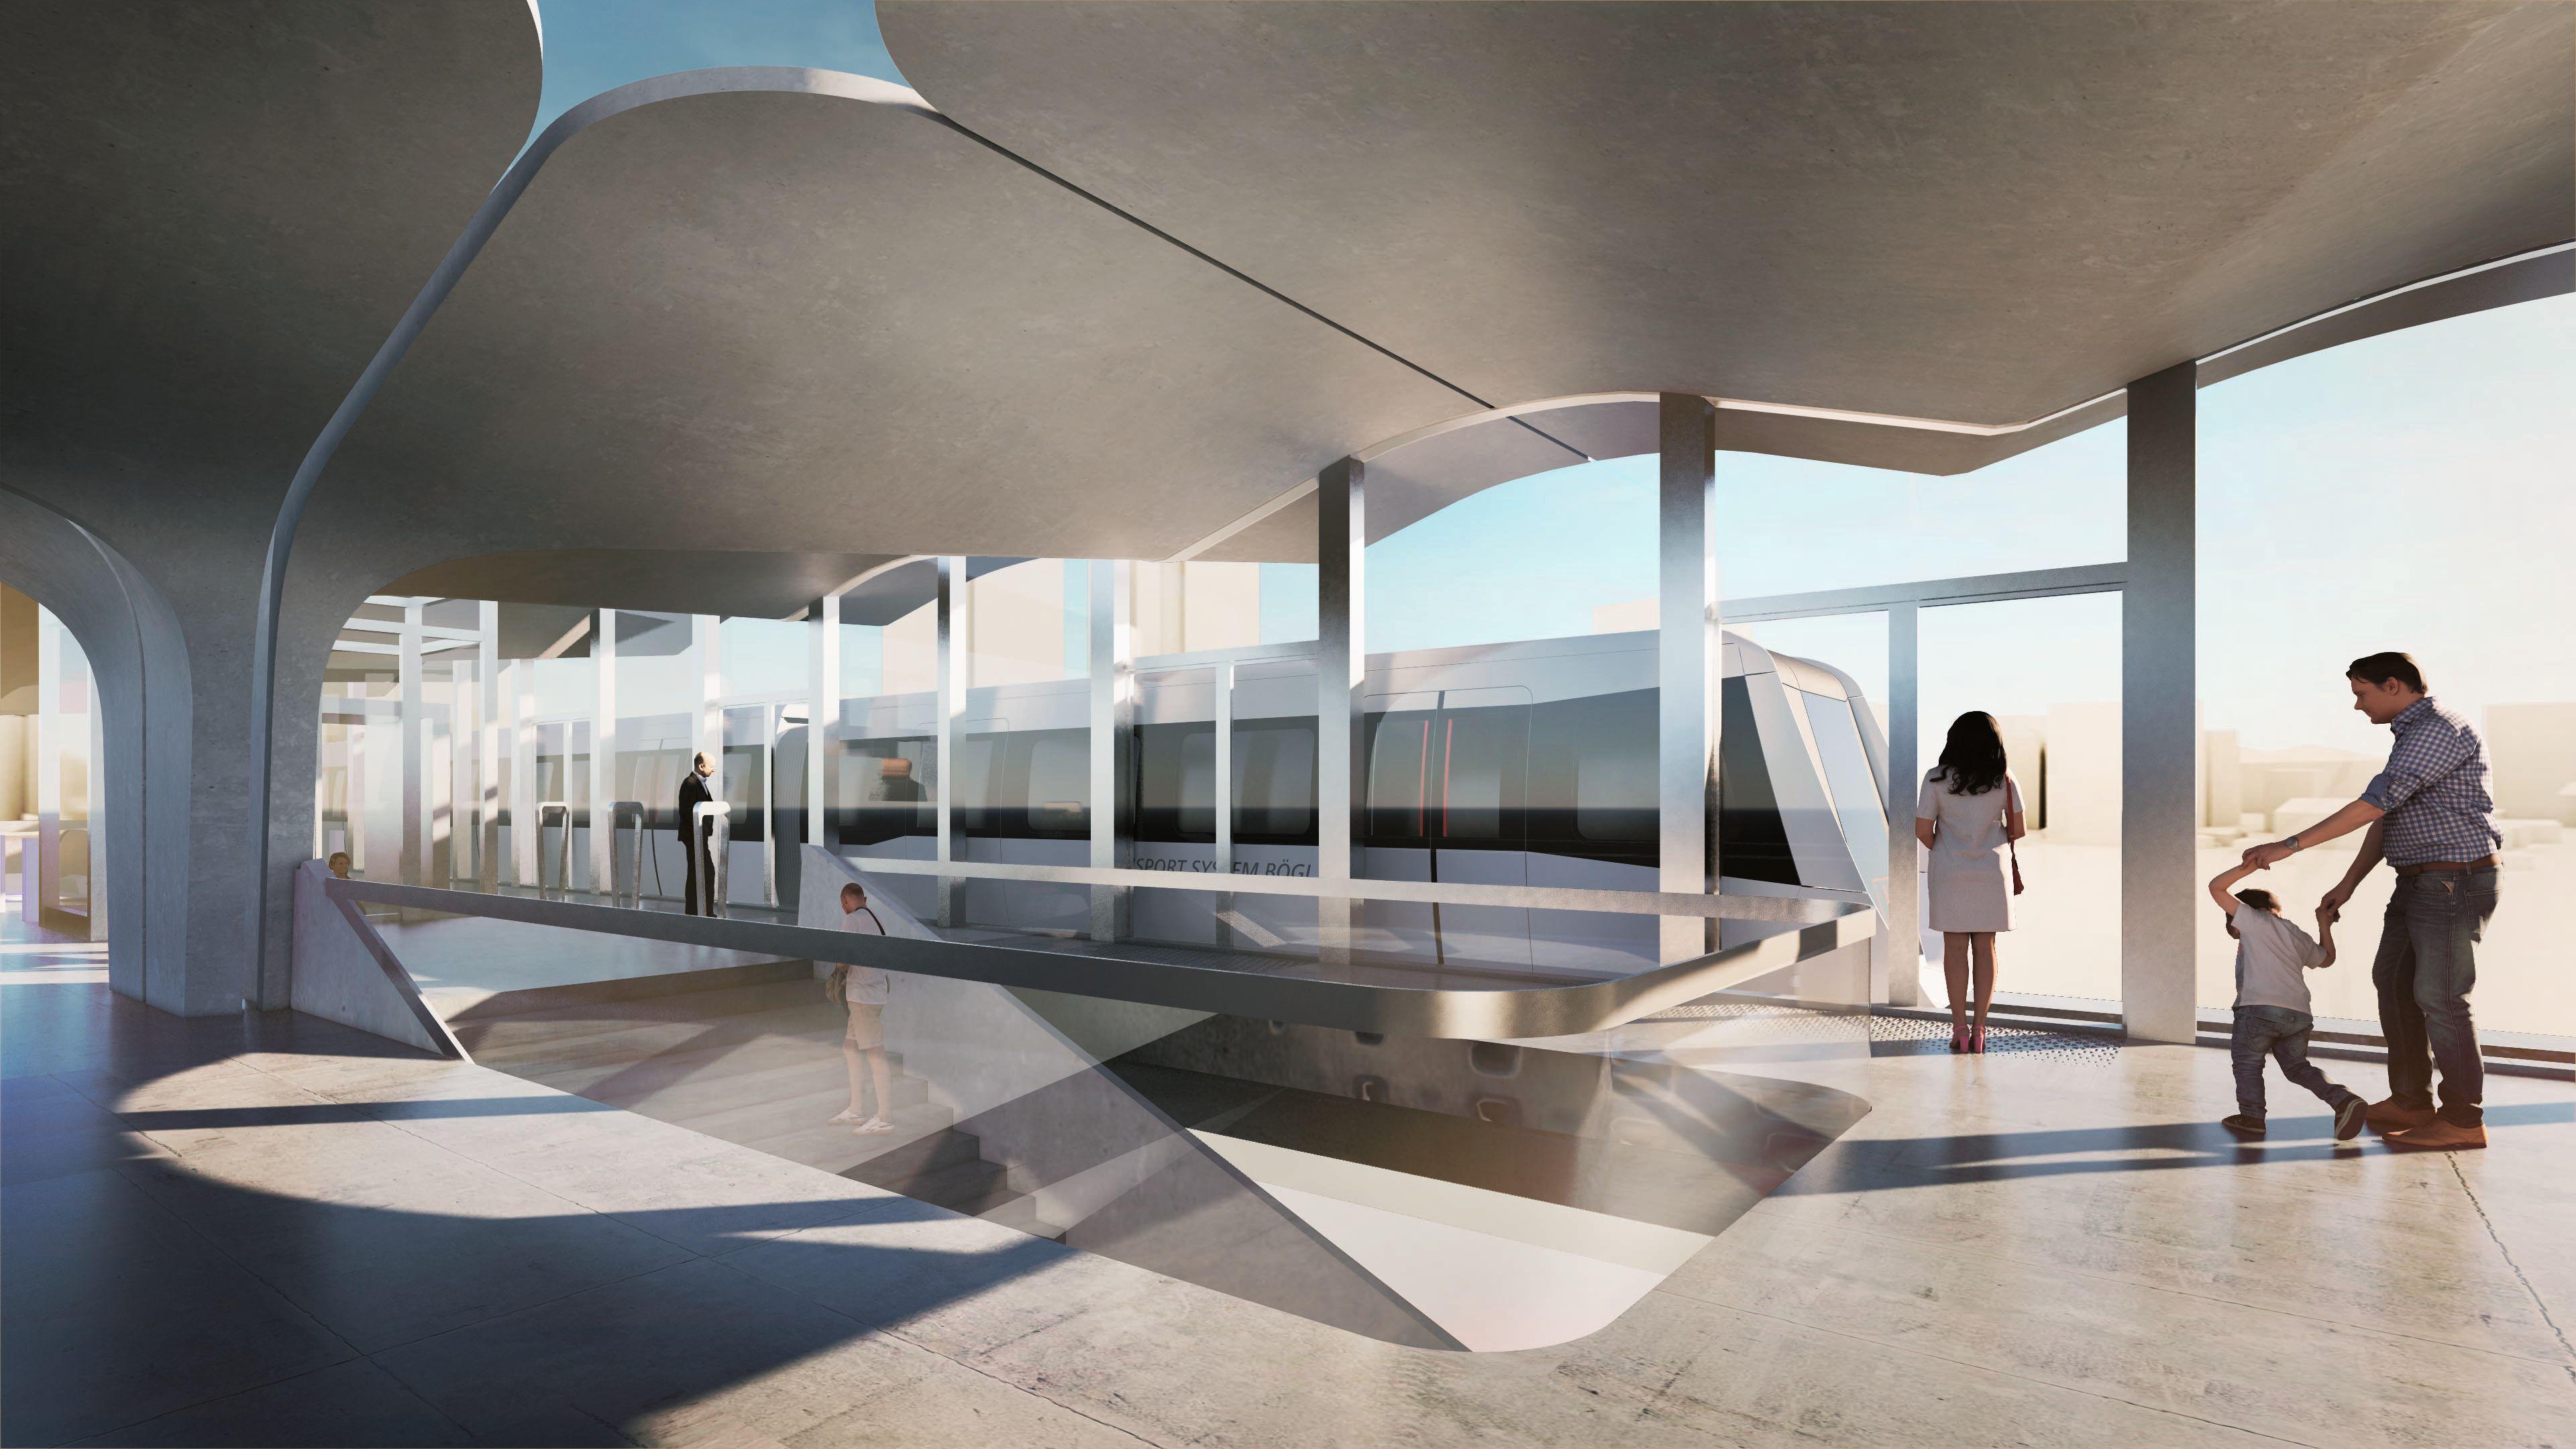 maglev train stations